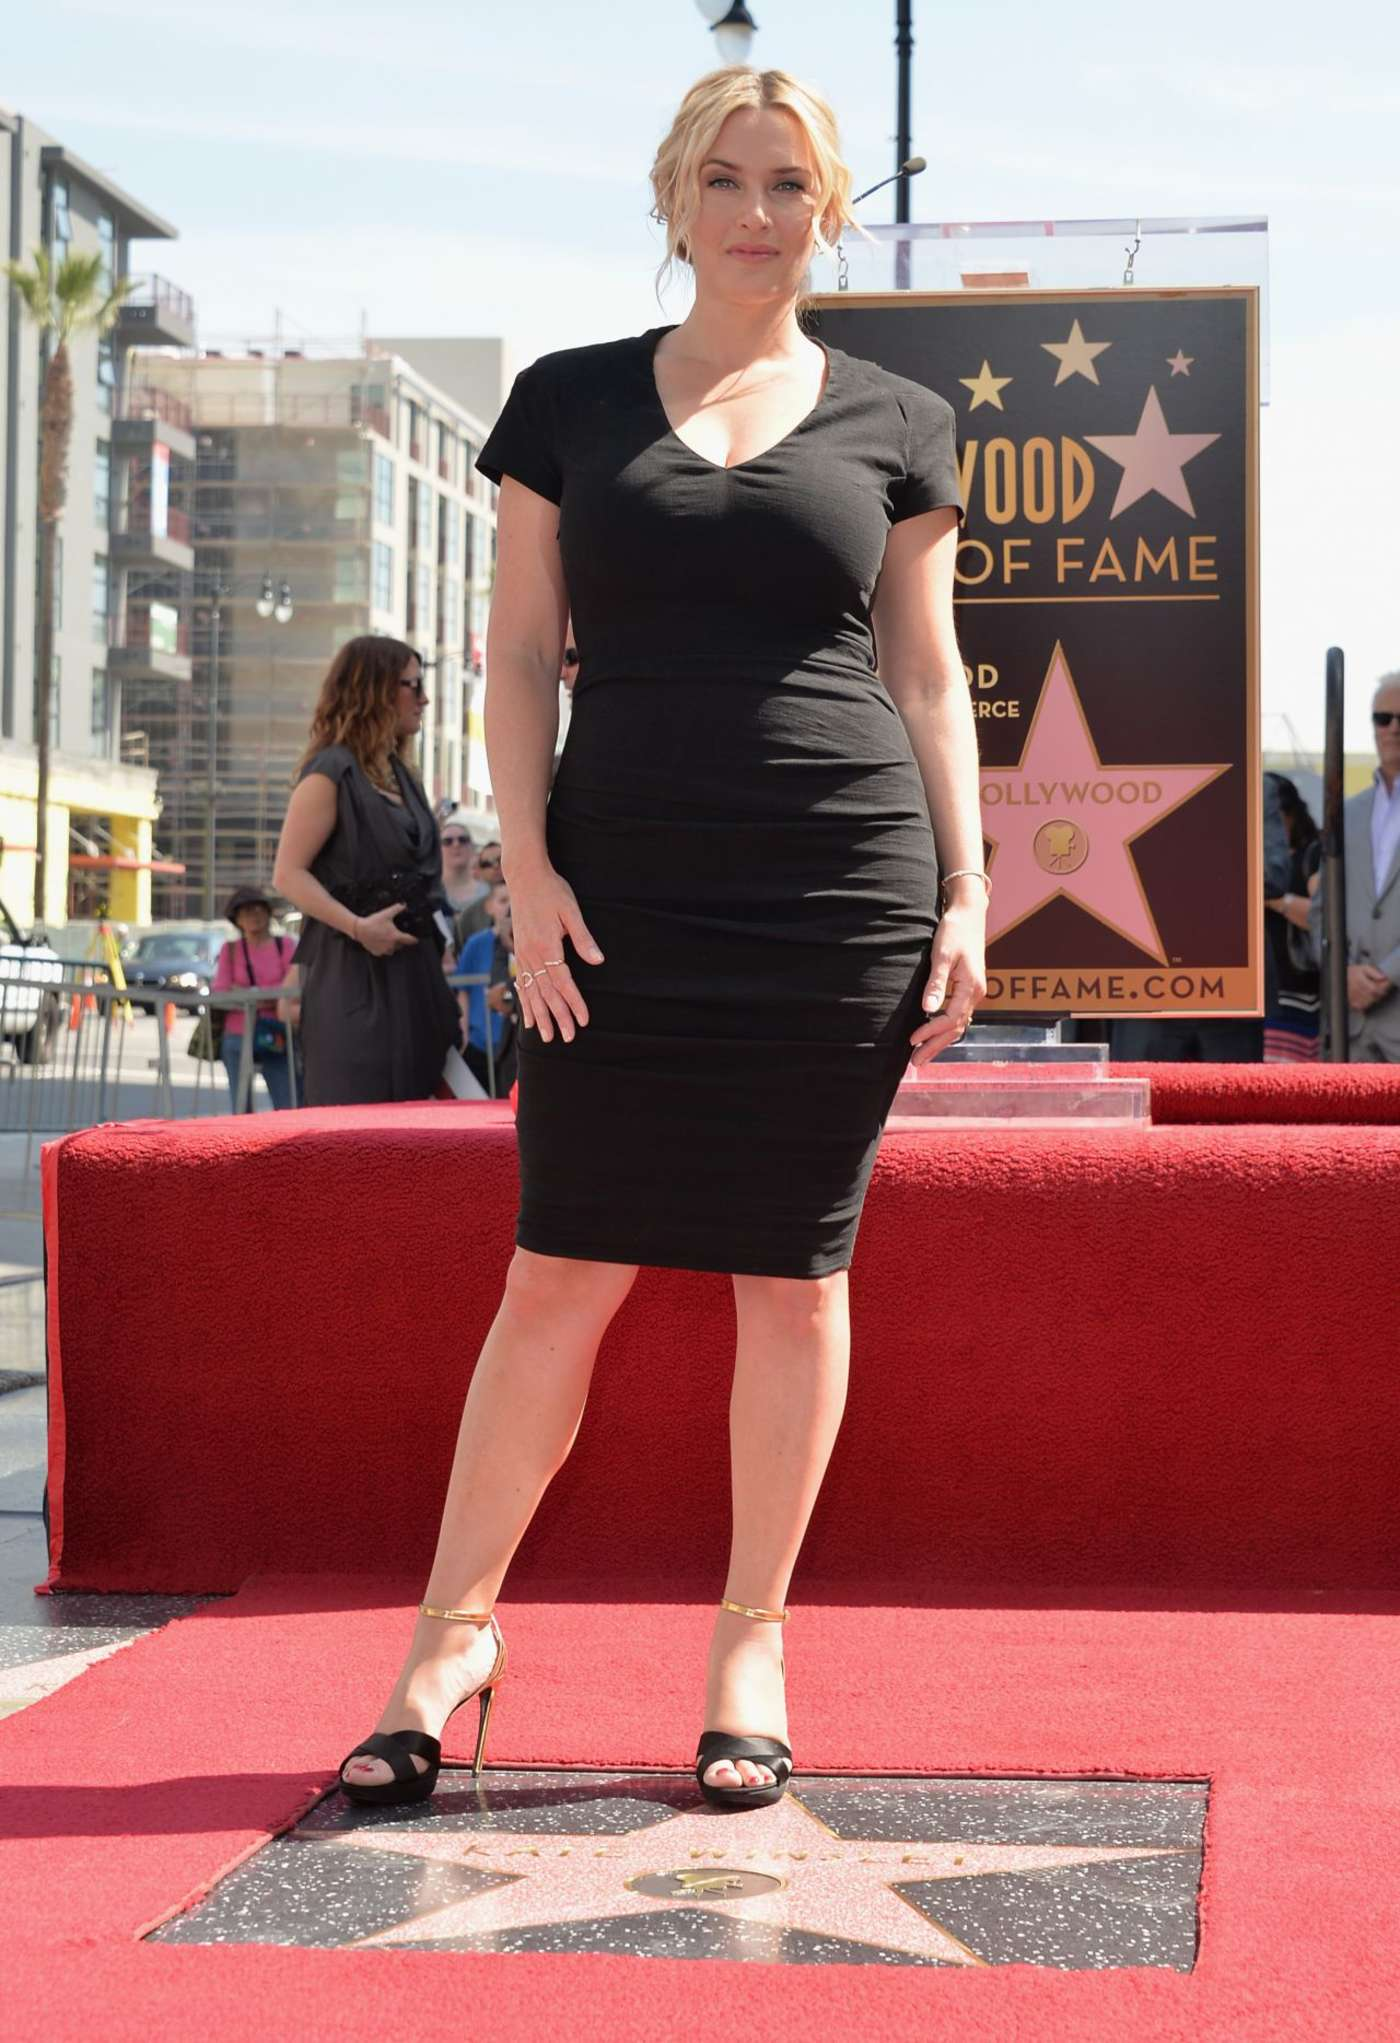 scarlett johansson gets her hollywood walk of fame star